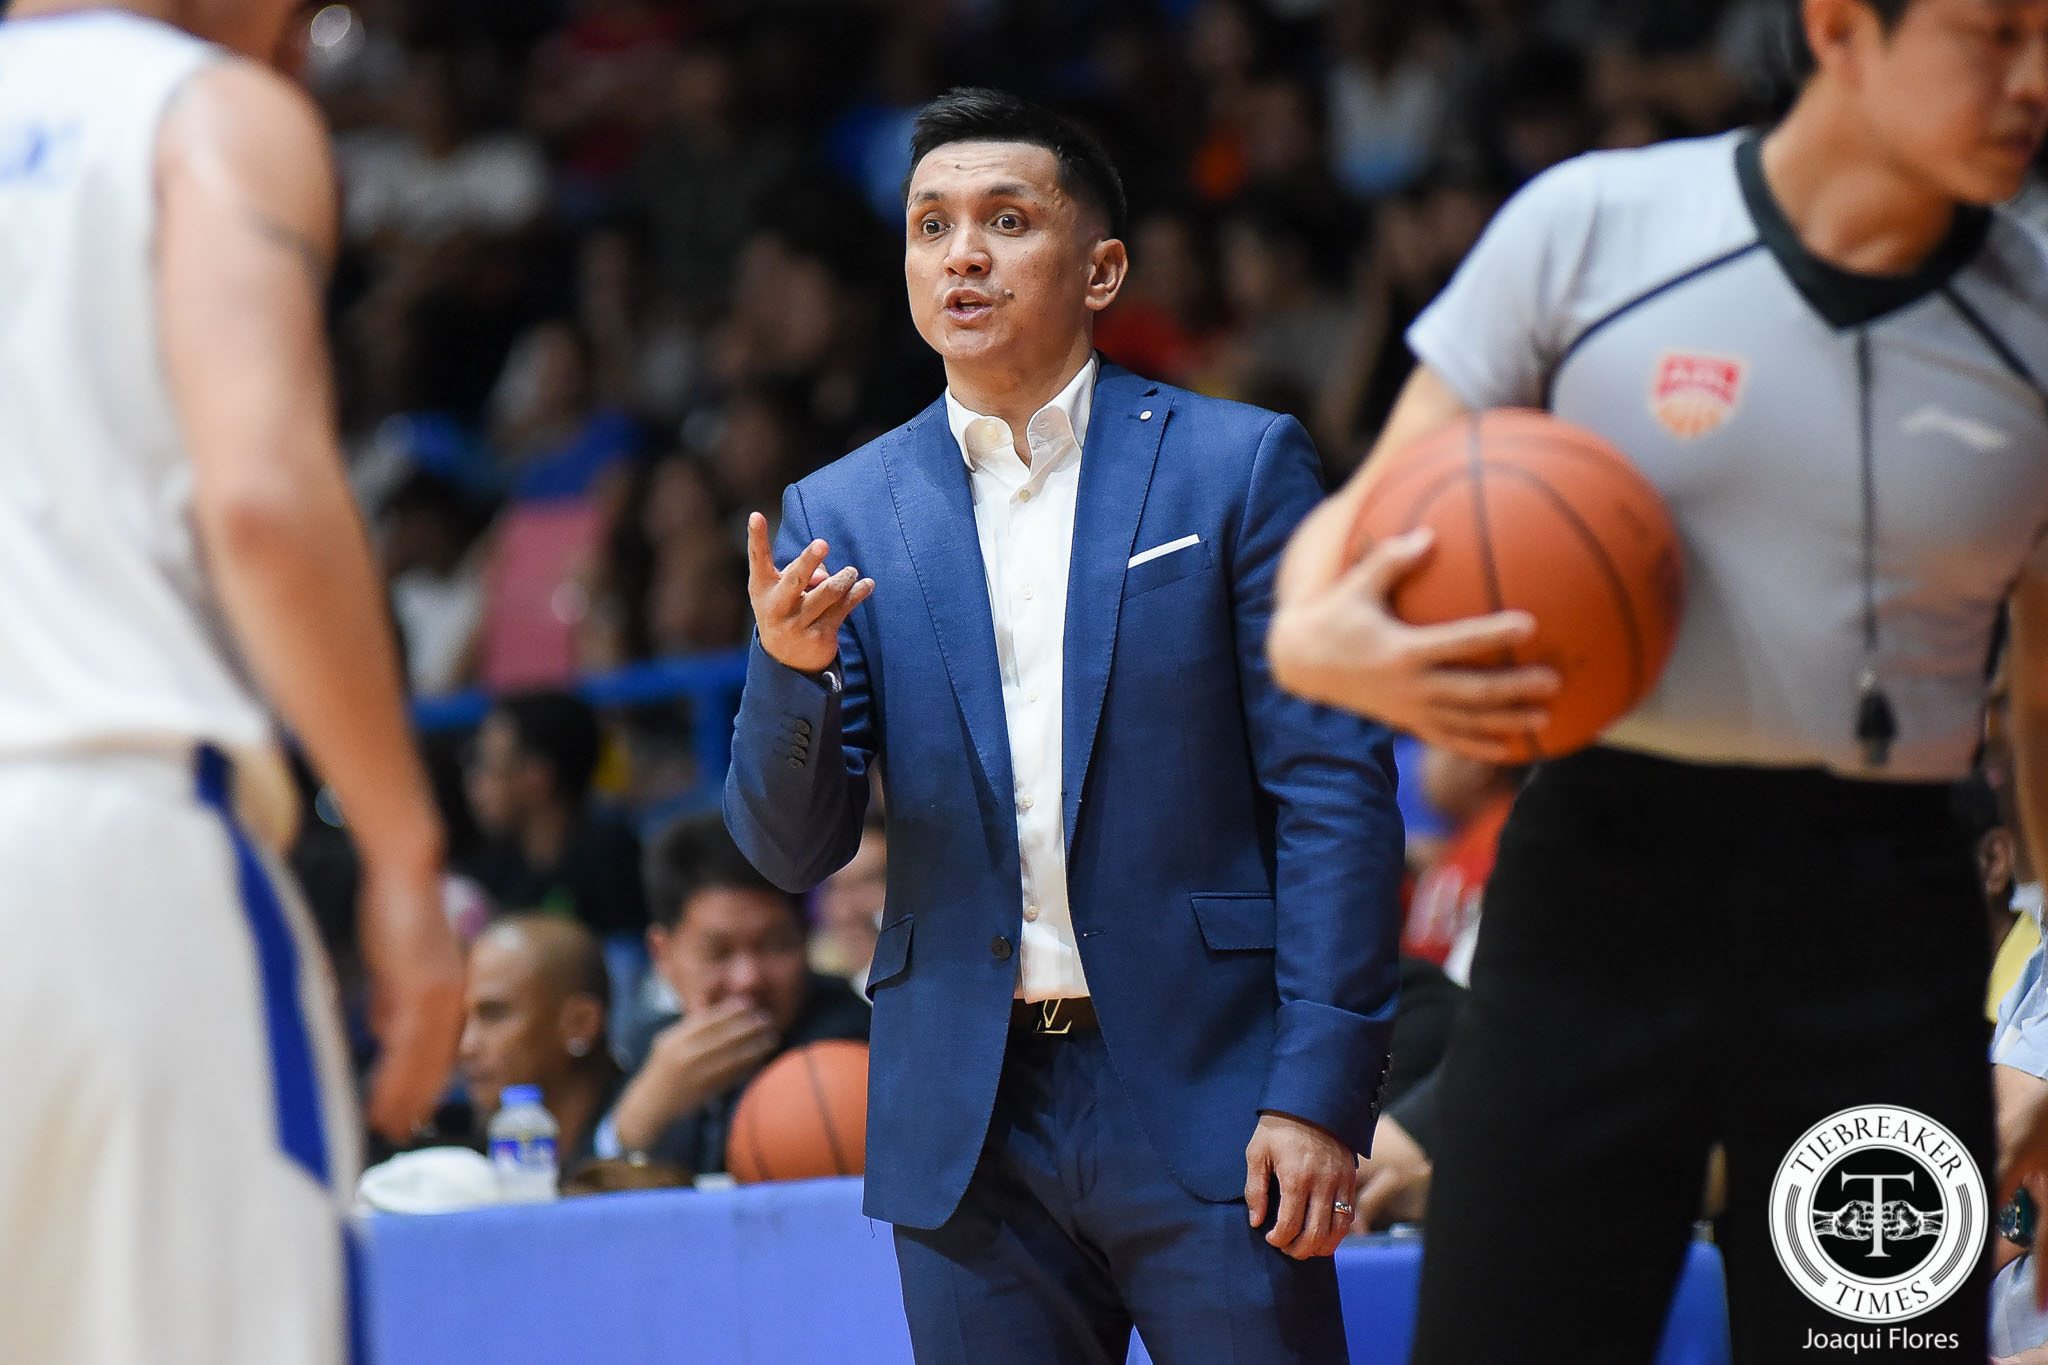 Philippine Sports News - Tiebreaker Times Renaldo Balkman plans to lead Alab to championship, hopes for PBA return ABL Alab Pilipinas Basketball News  Renaldo Balkman Jimmy Alapag 2017-18 ABL Season